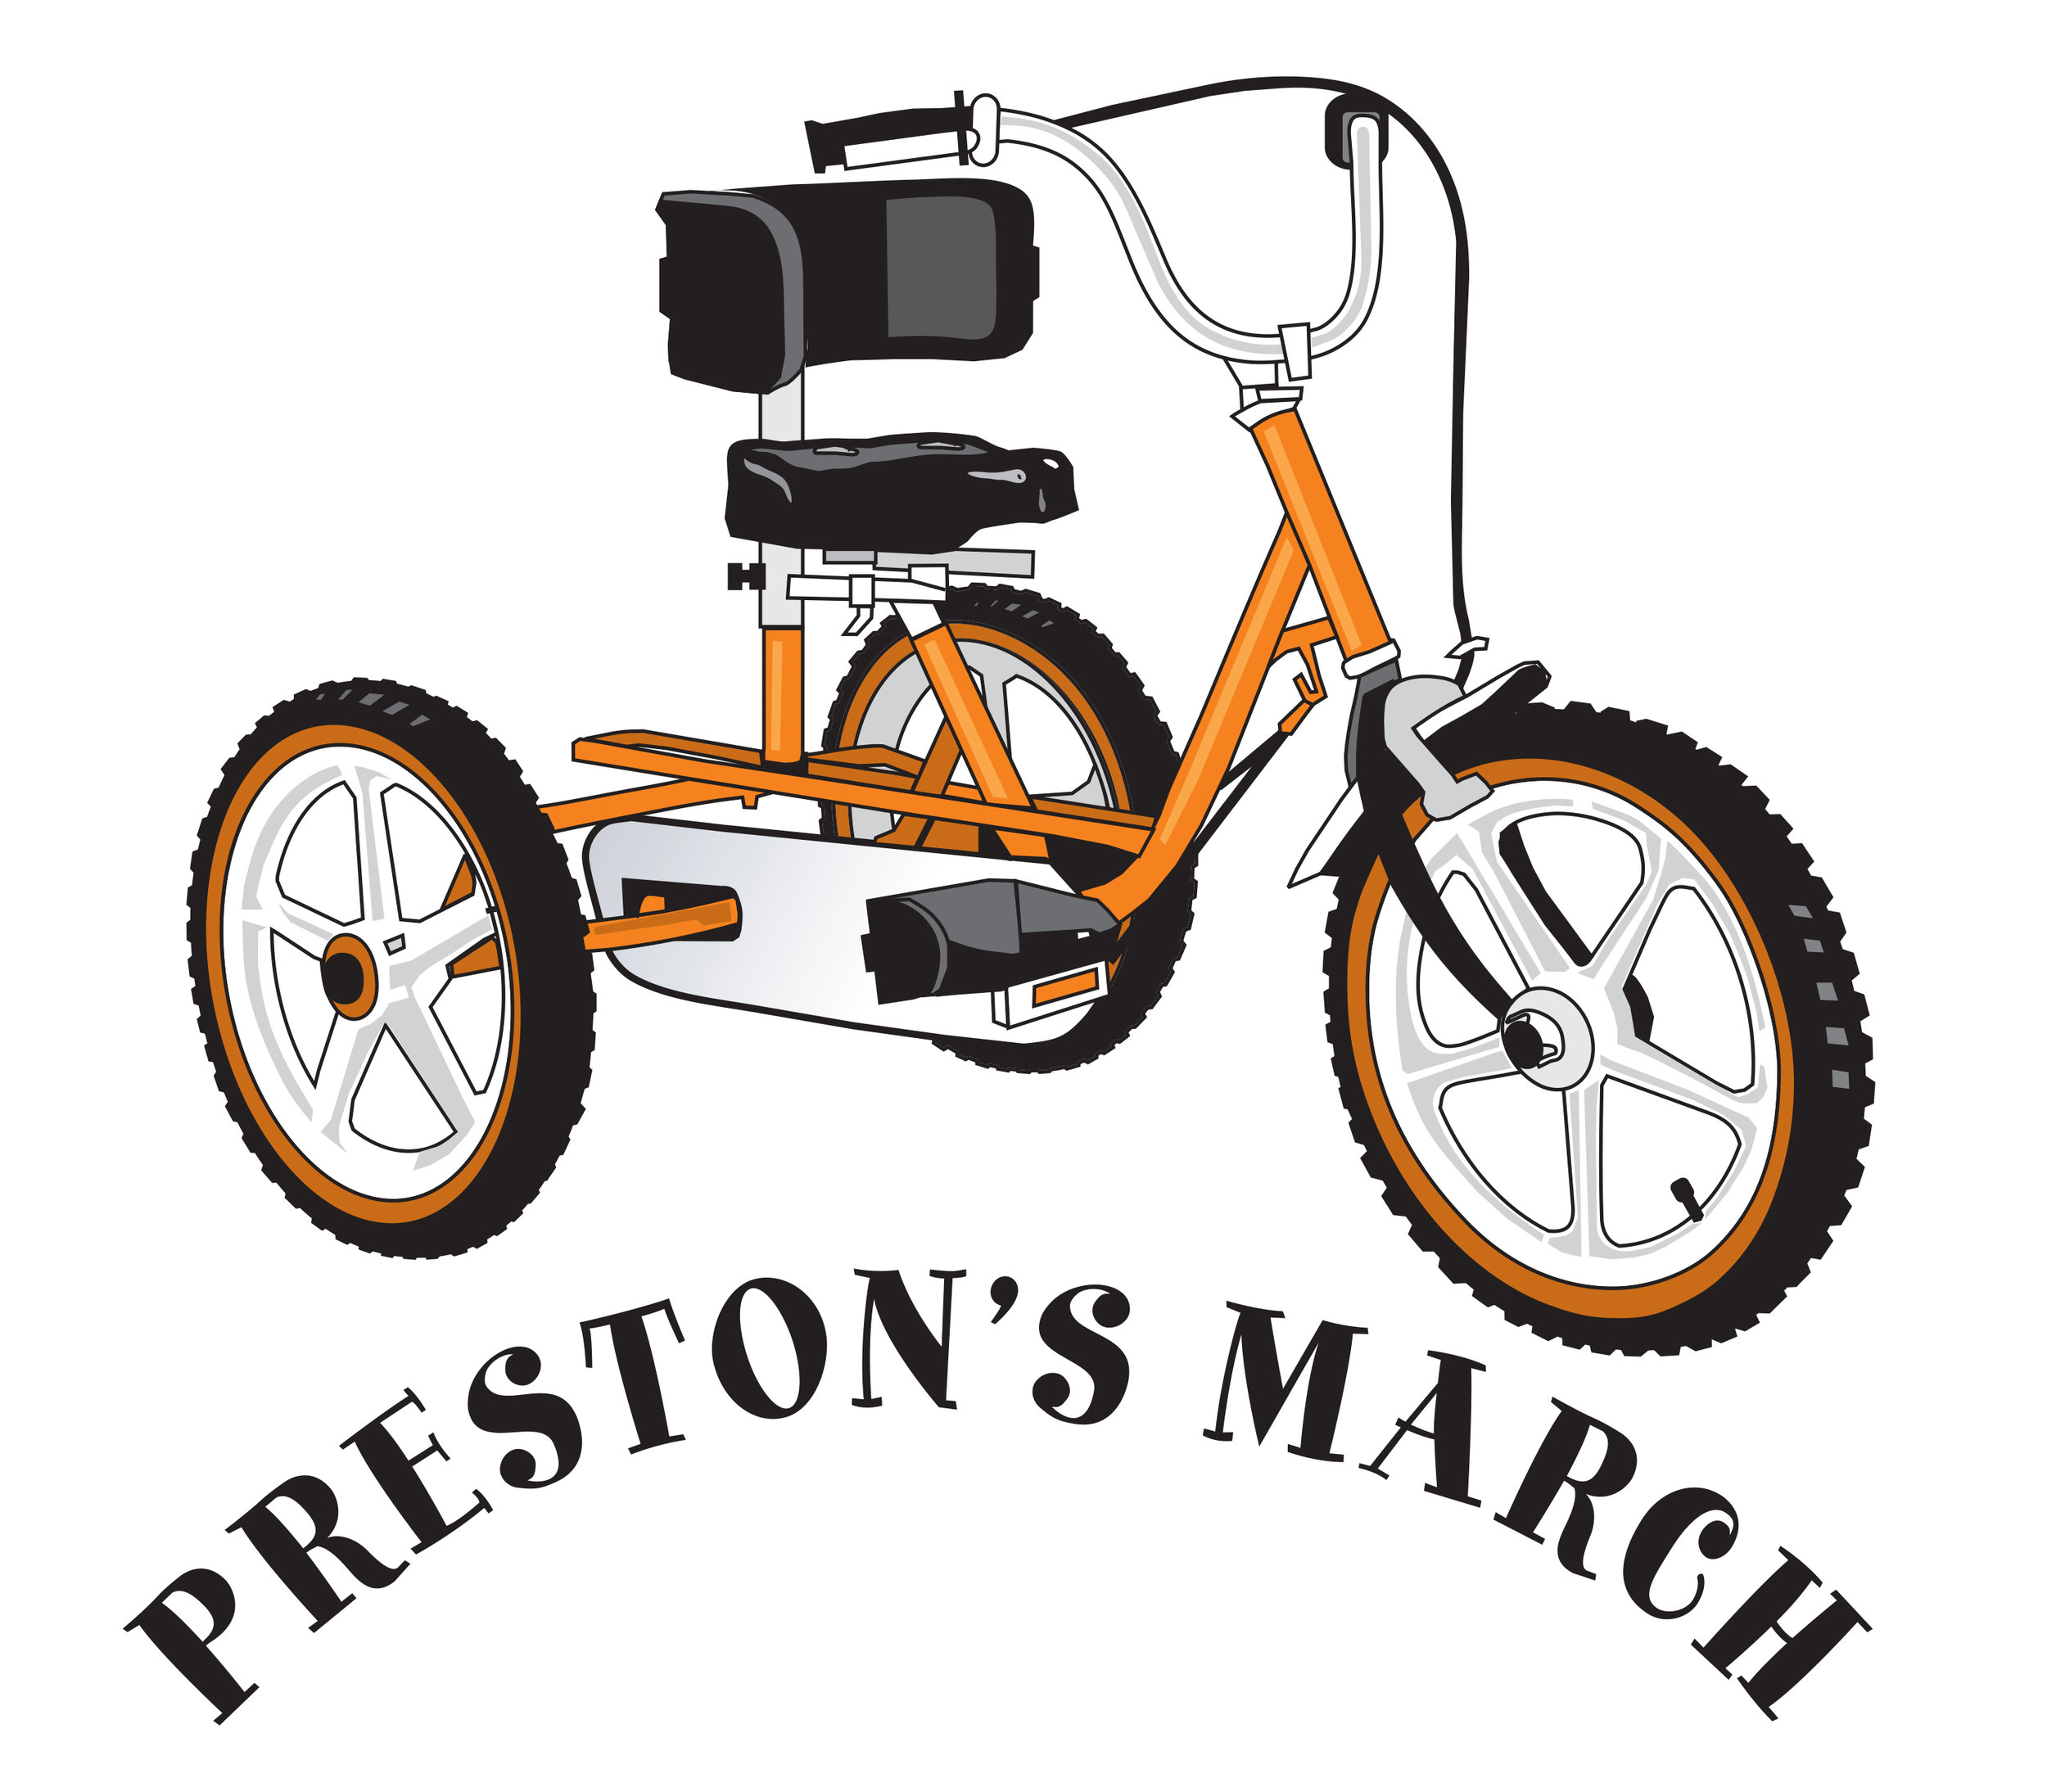 PrestonsMarch_Logo2018.jpg